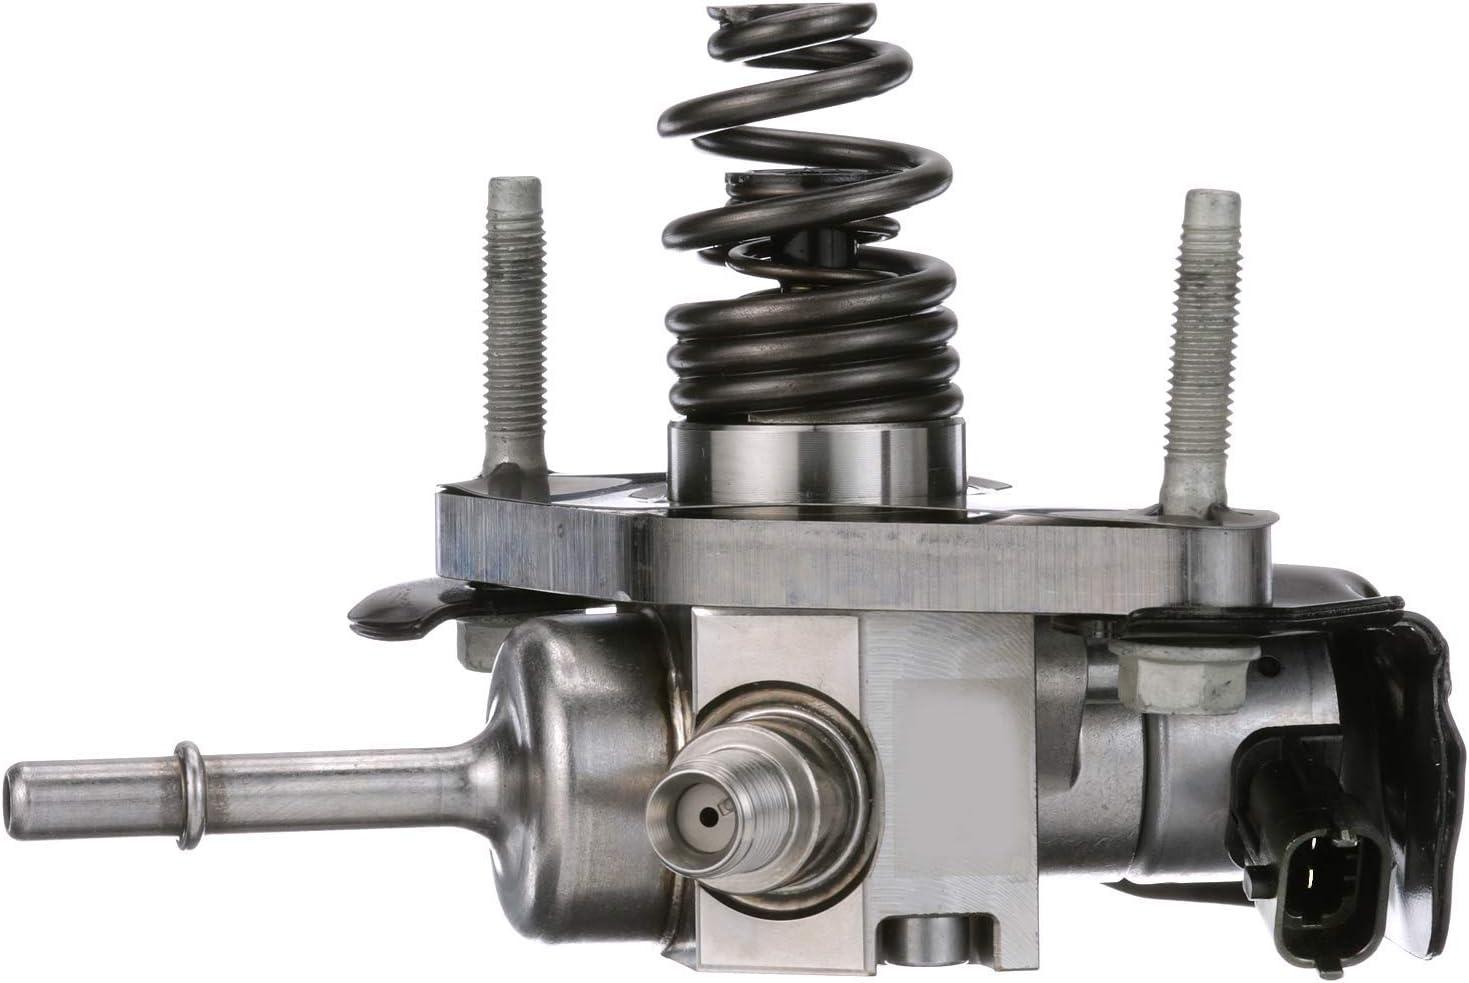 Delphi HM10027 Direct Injection High Pressure Fuel Pump